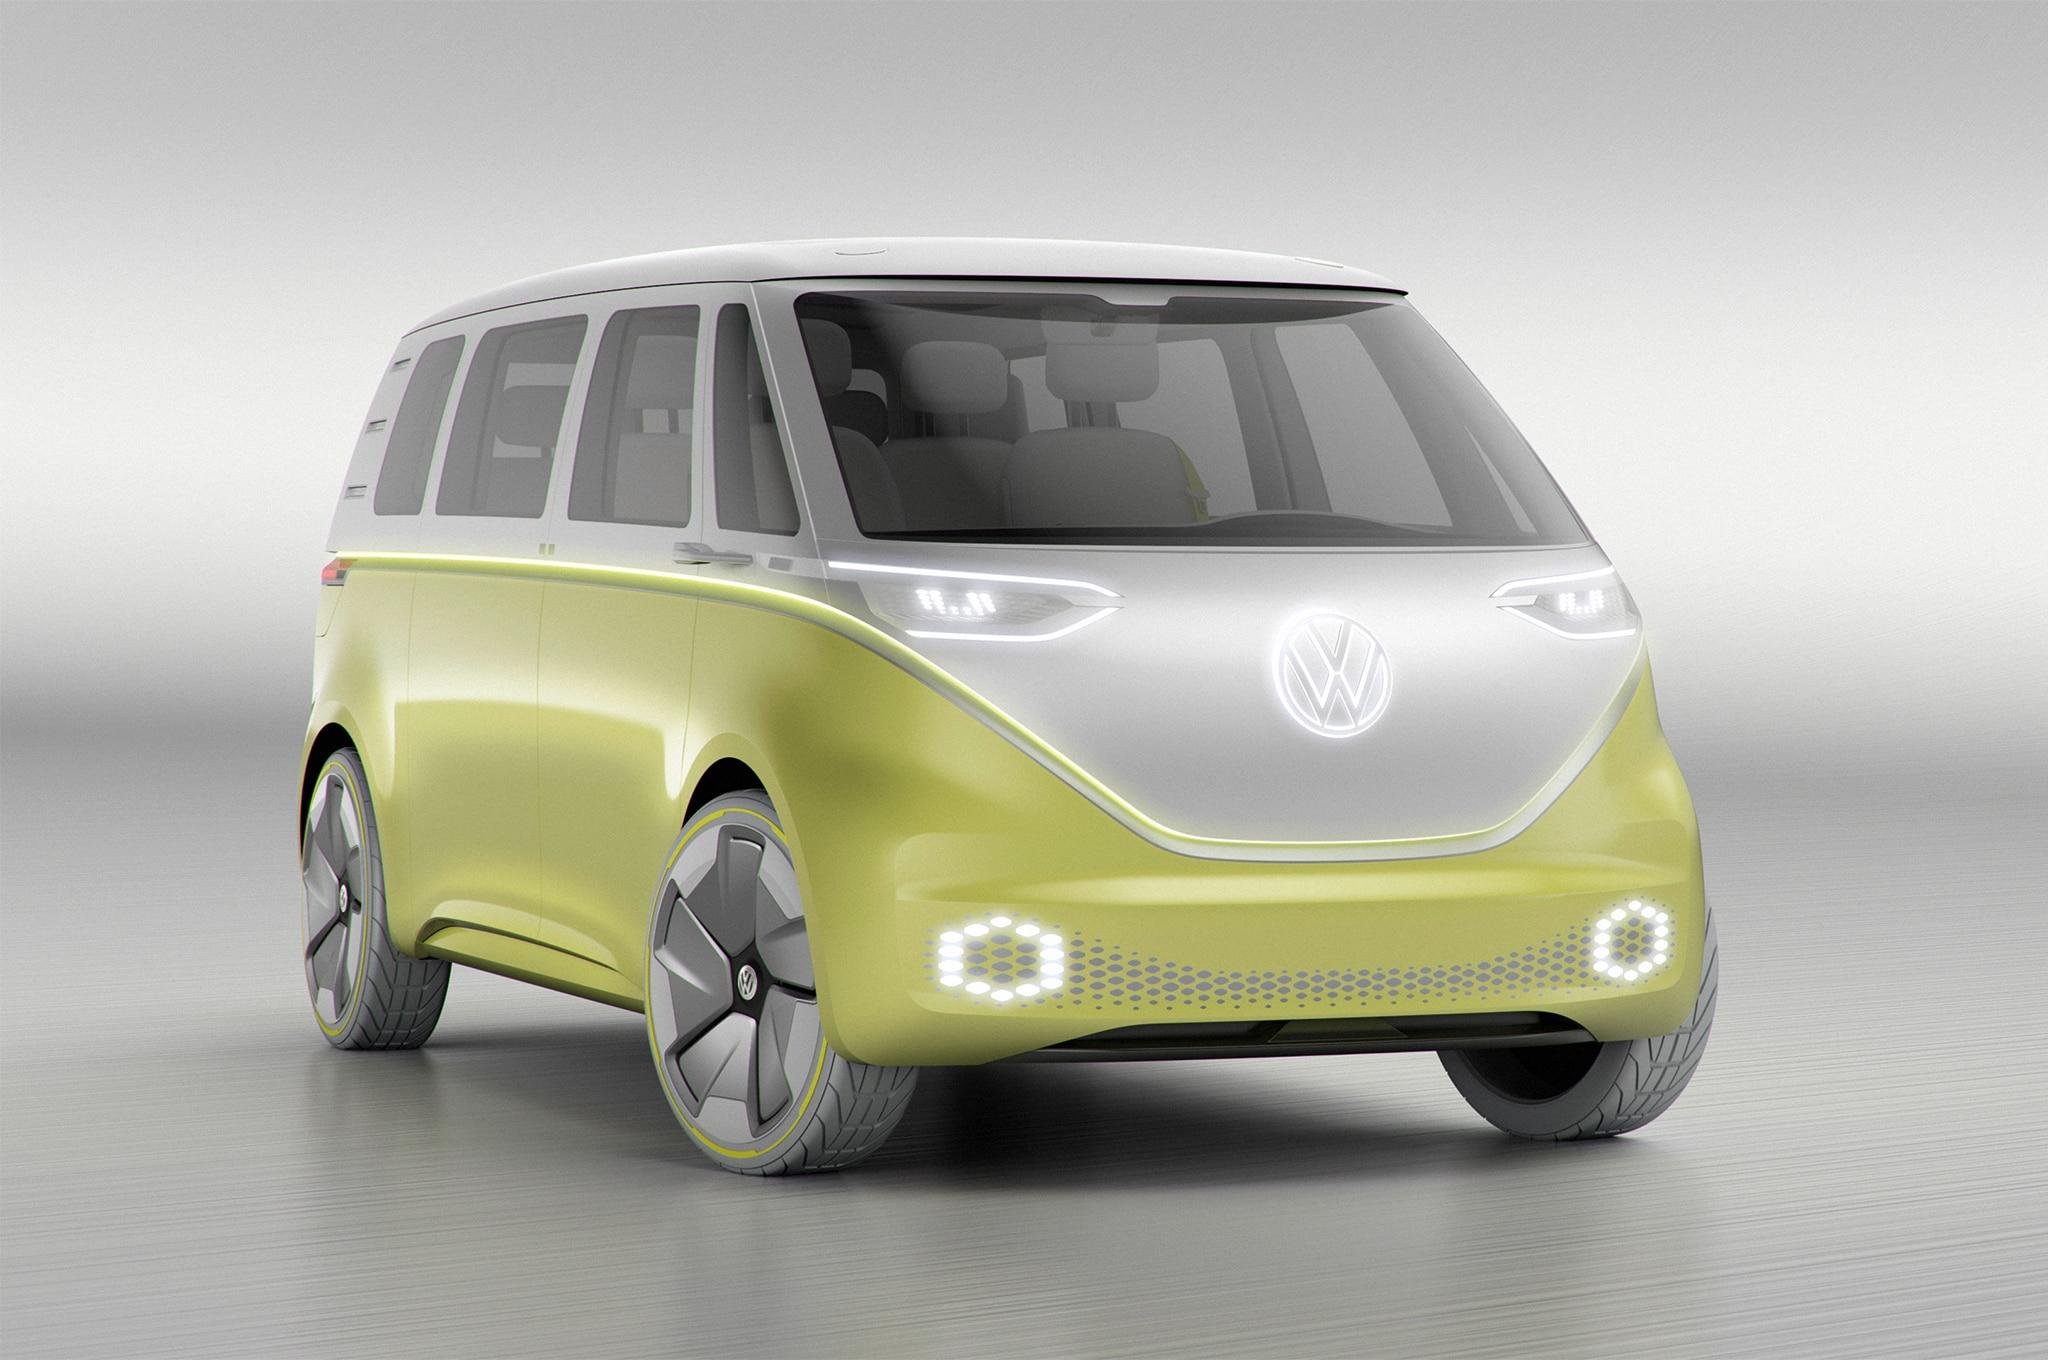 Volkswagen ID BUZZ Concept Front Three Quarter 02 3